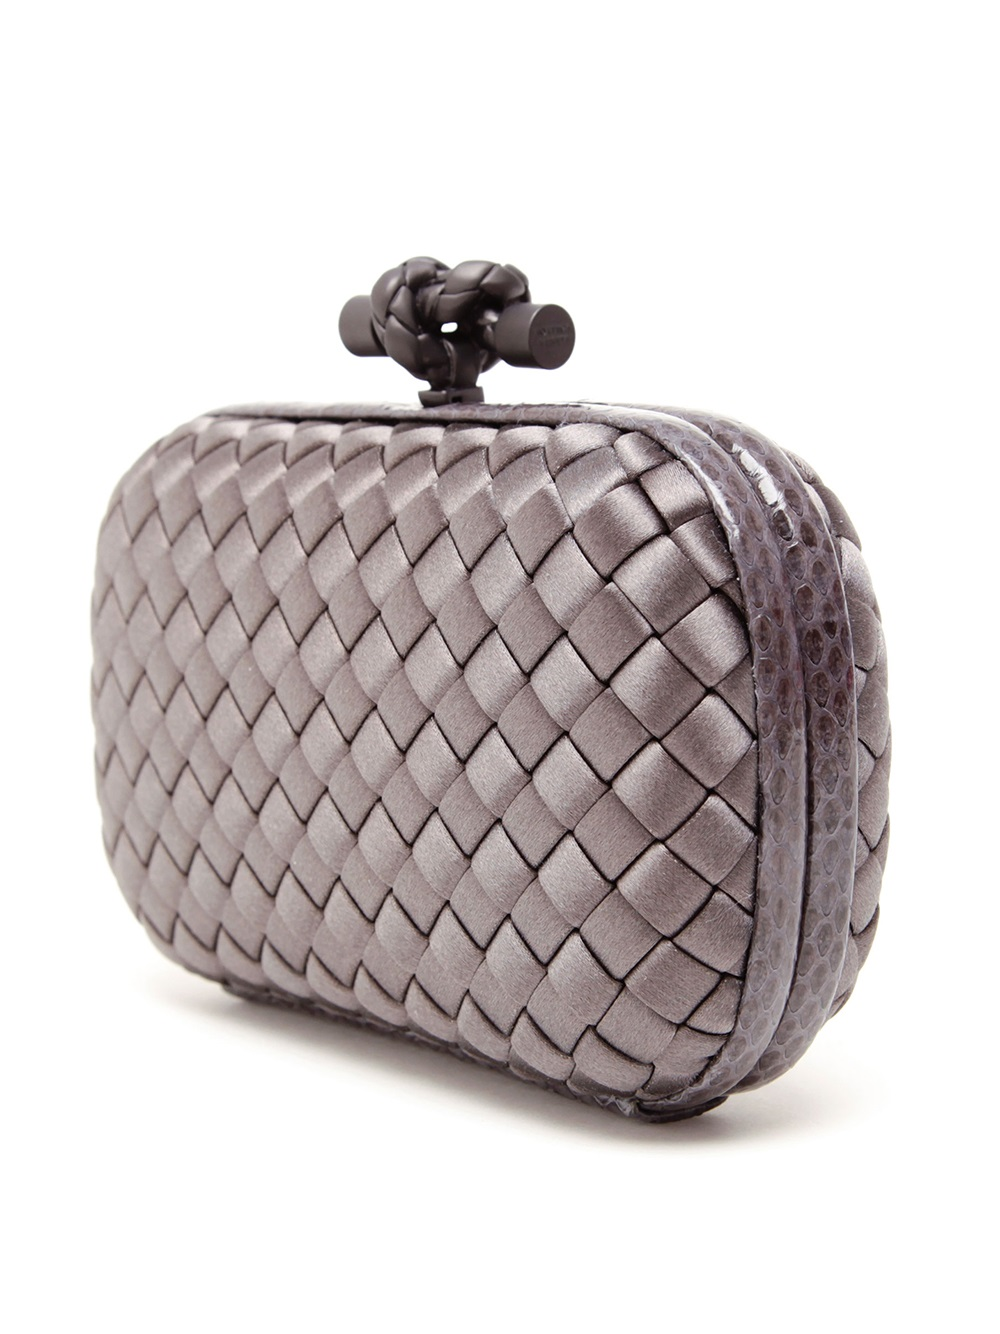 bottega veneta intrecciato woven satin box clutch in gray grey lyst. Black Bedroom Furniture Sets. Home Design Ideas